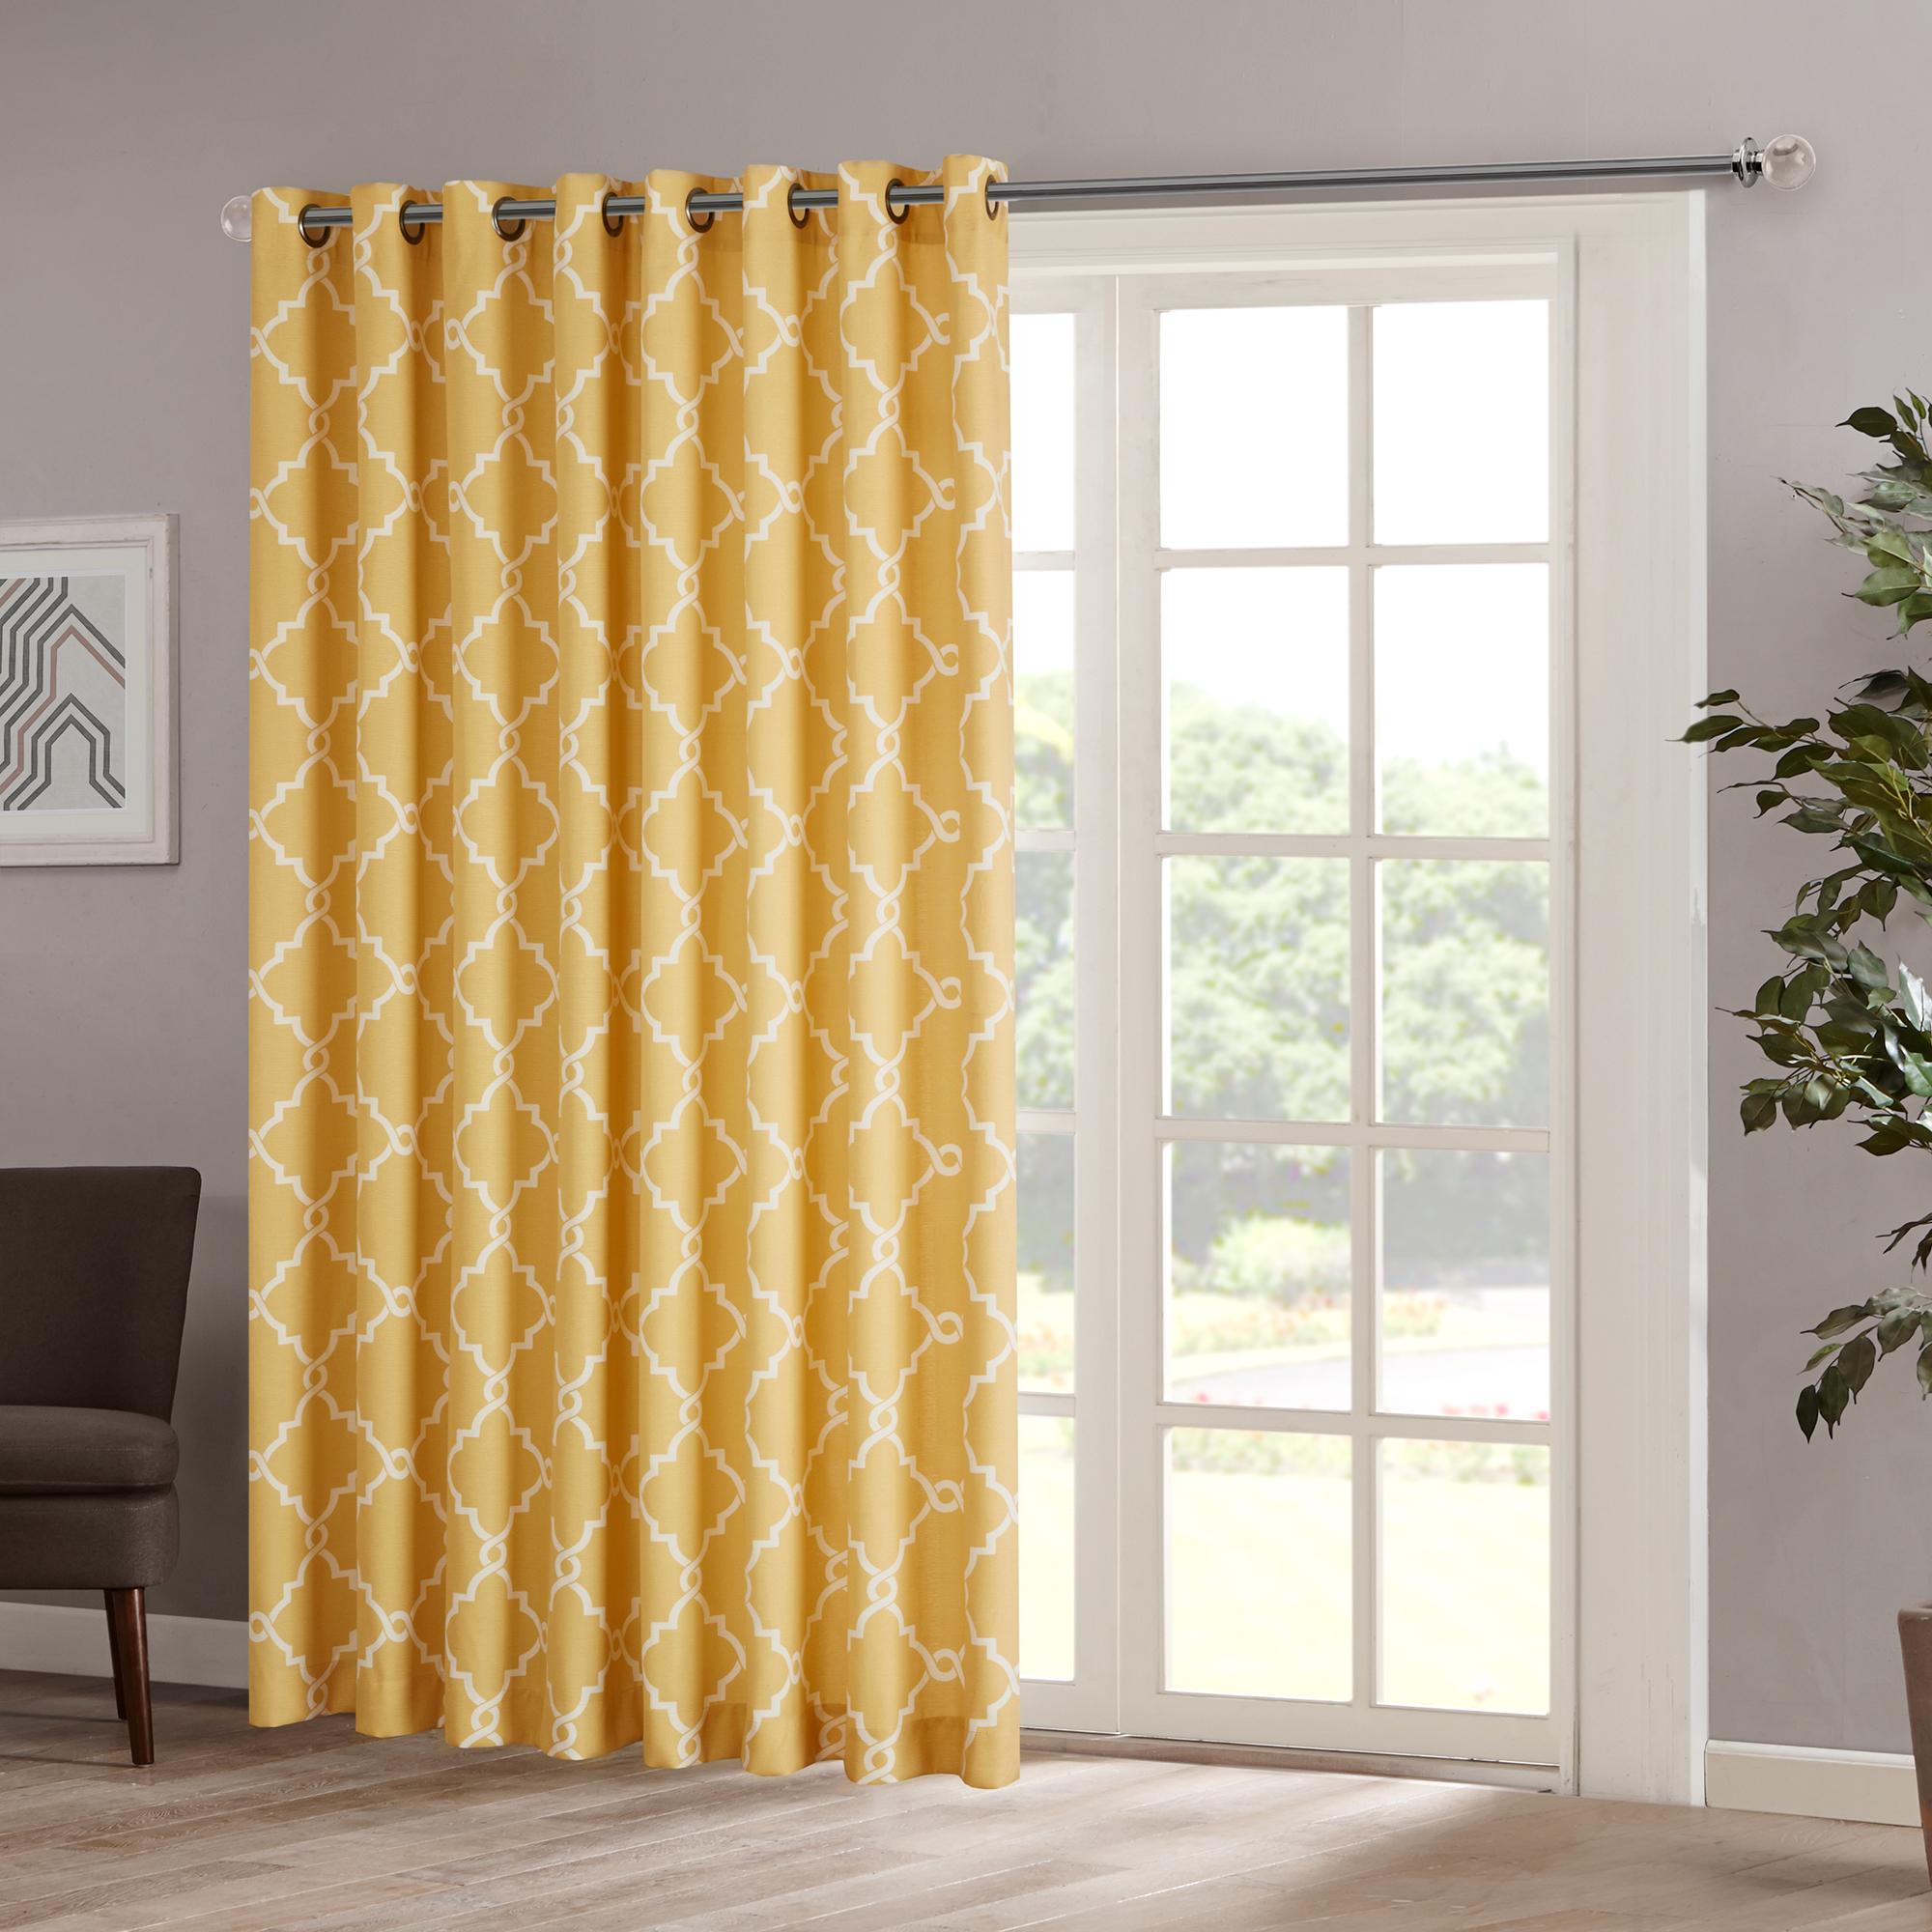 Home Essence Sereno Fretwork Print Patio Window Panel Throughout Fretwork Print Pattern Single Curtain Panels (View 16 of 20)